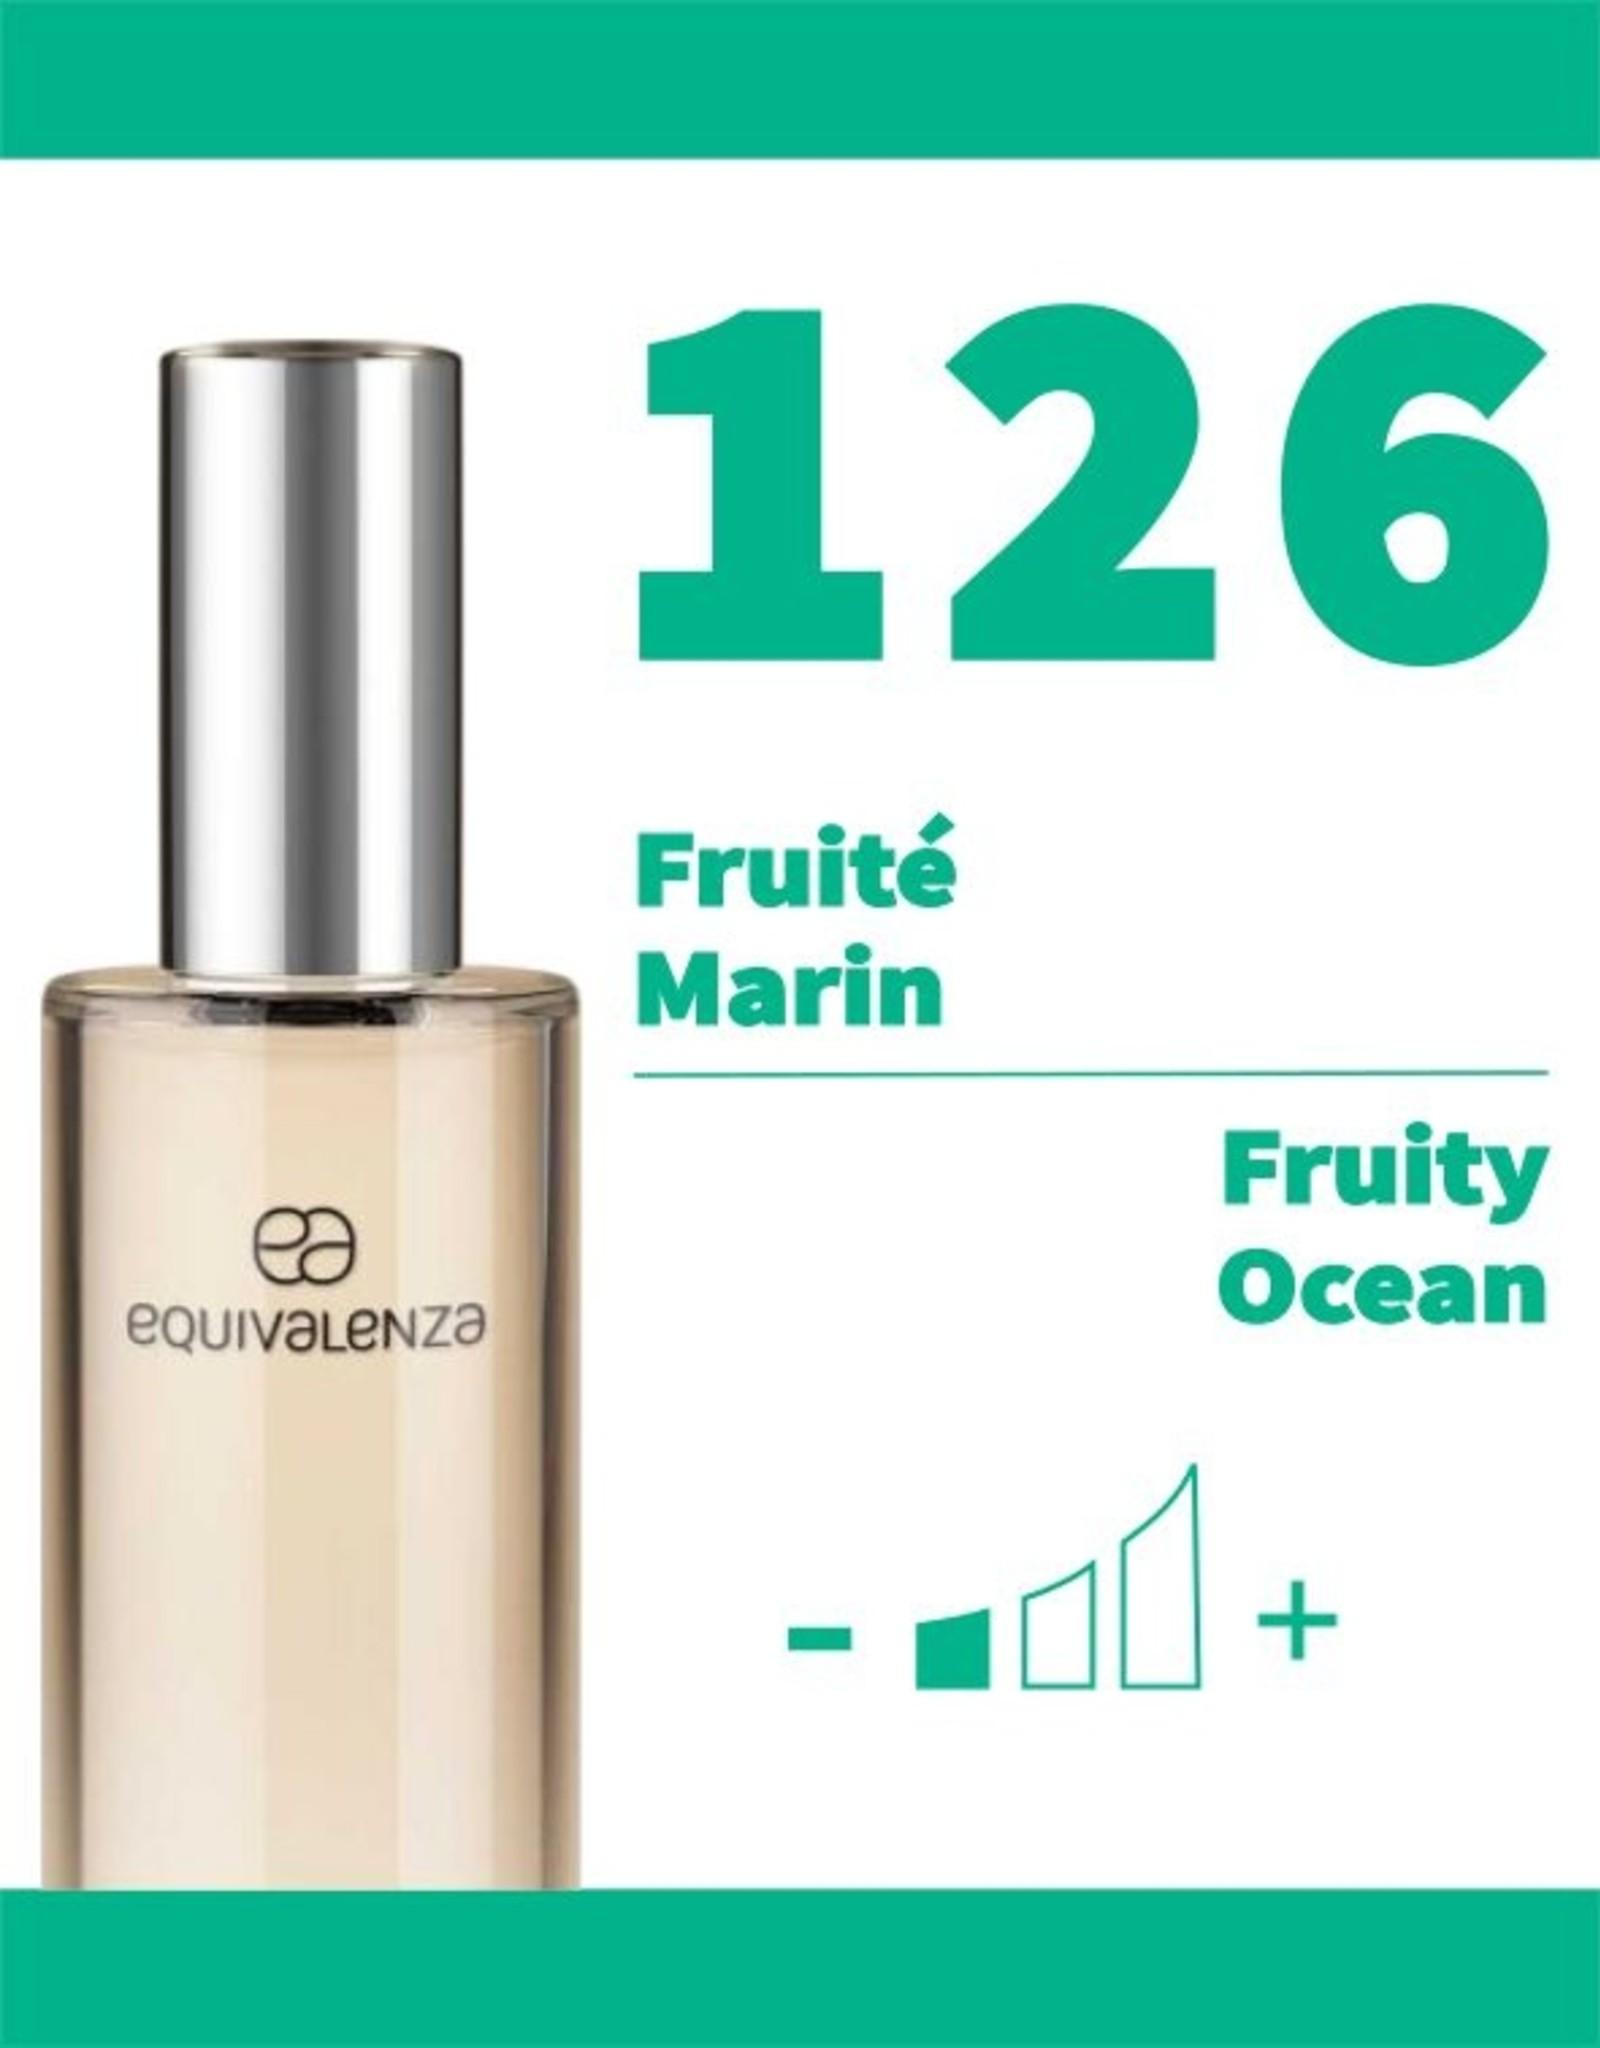 Equivalenza Eau de Toilette Fruity Ocean 126